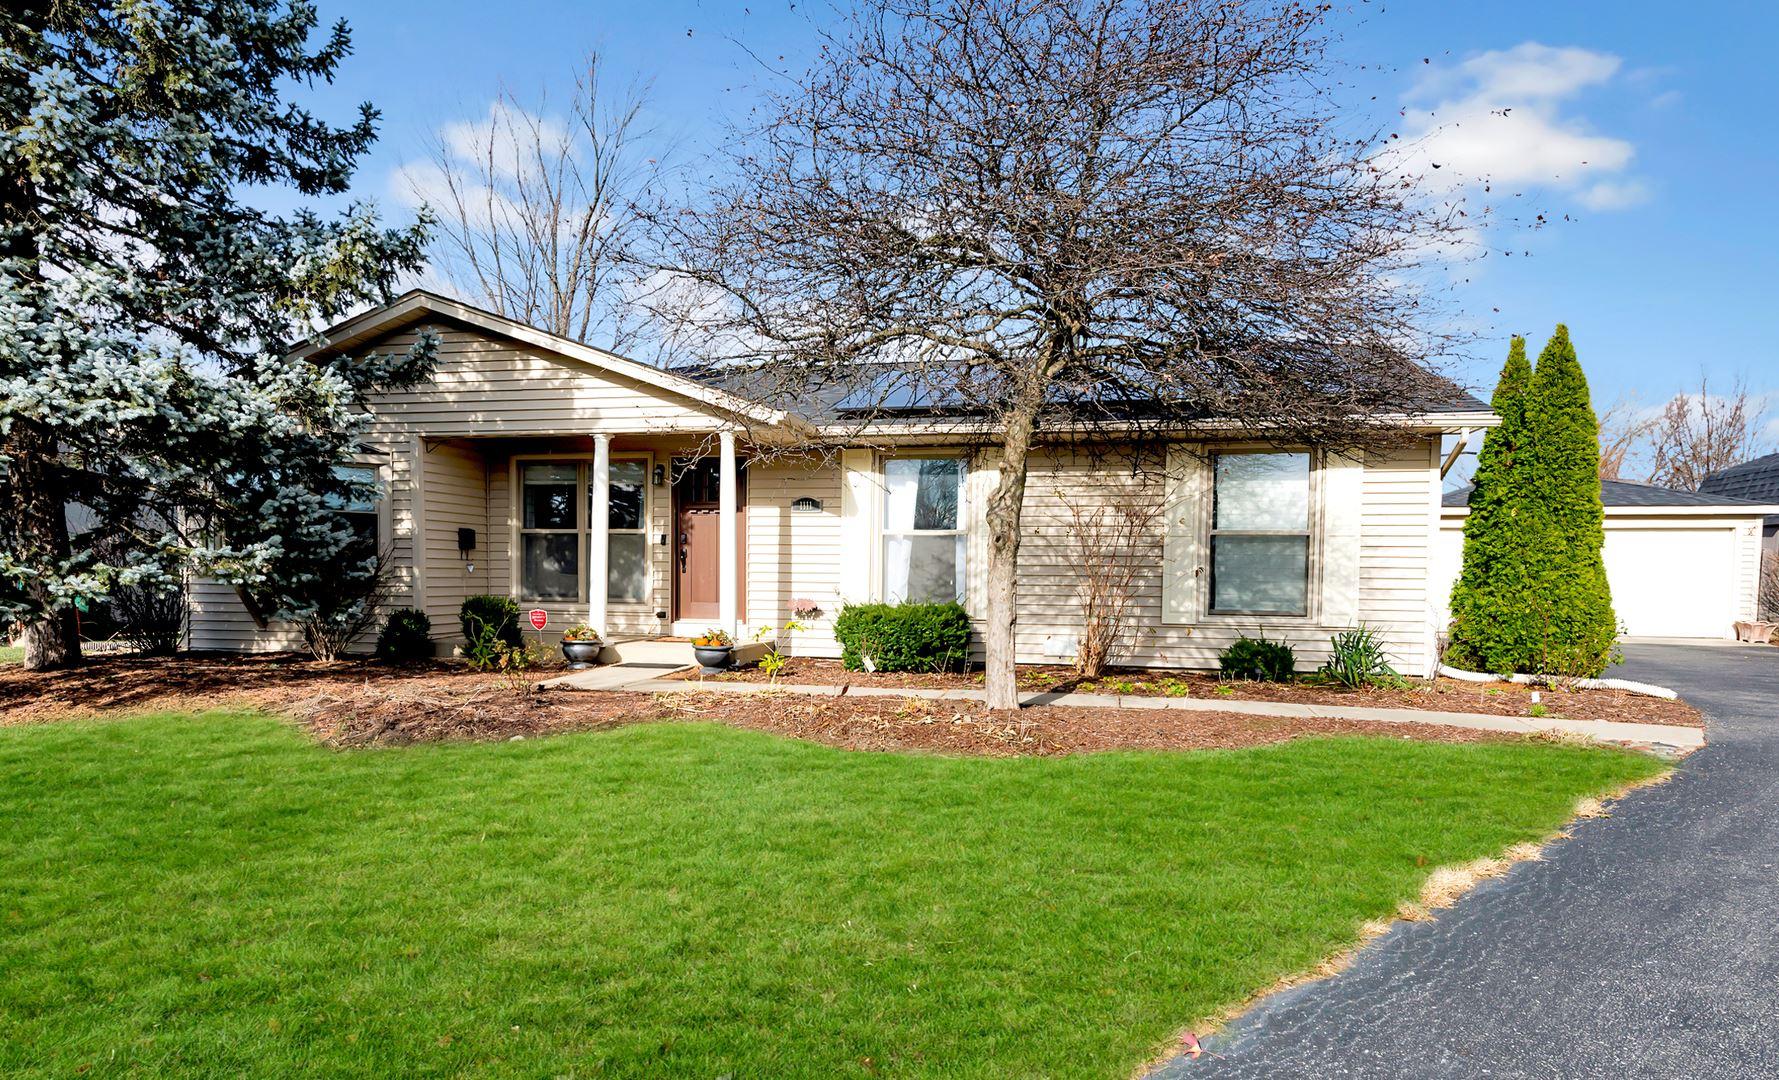 1111 Lovell Court, Elk Grove Village, IL 60007 - #: 10978962